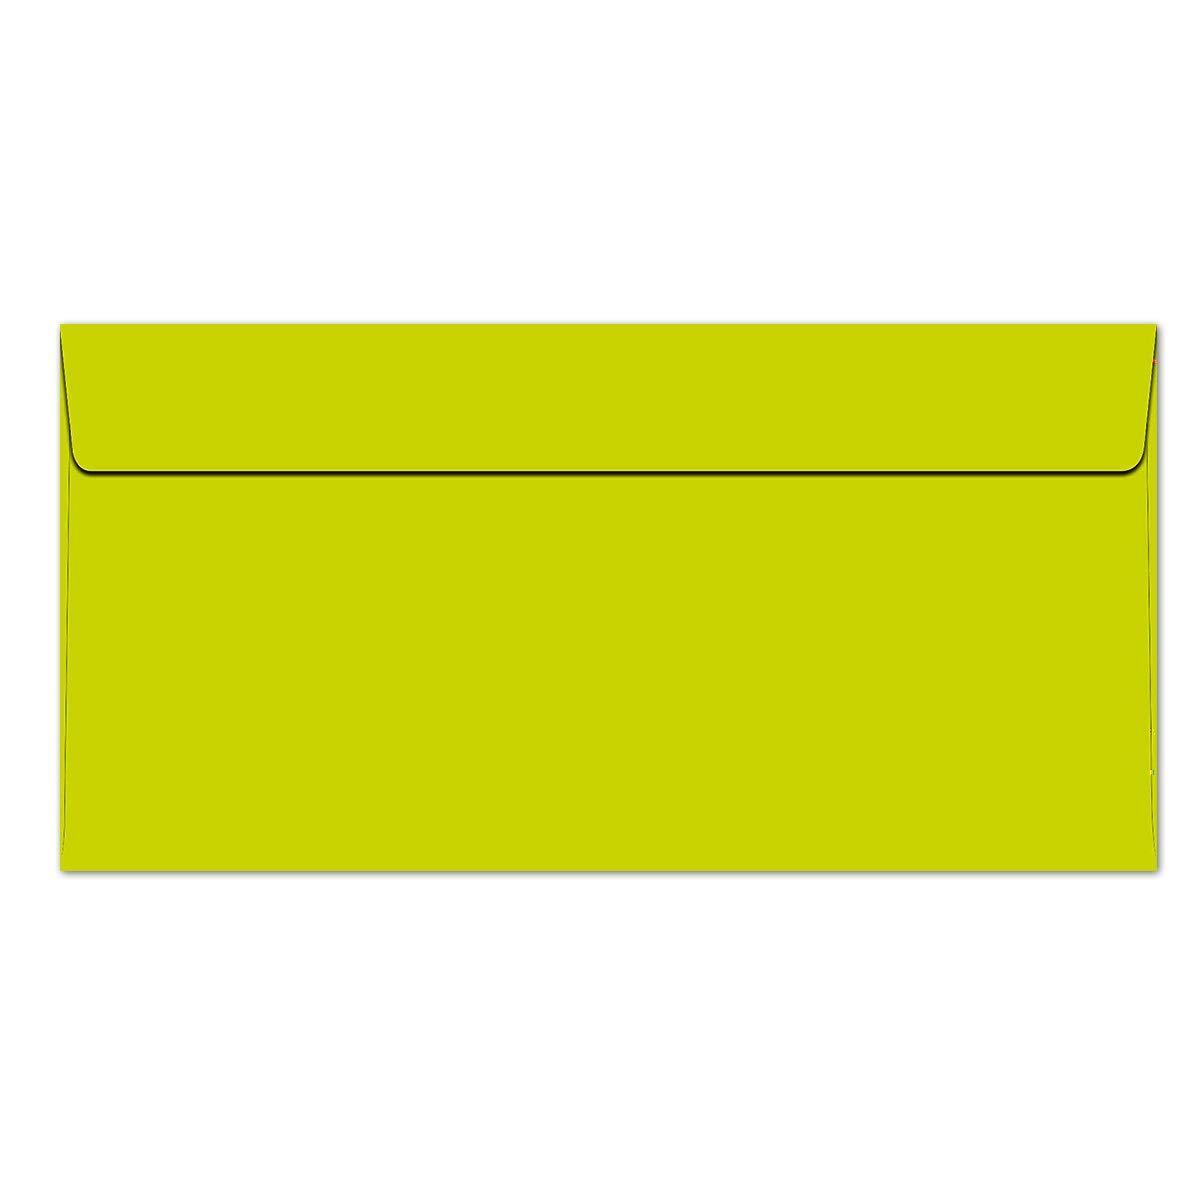 /QUALIT/À marca: Colore froh Buste DIN lungo/ /100/G//M/²/ /QUALIT/À PREMIUM/ /110/X 220/mm/ /Molto Resistente/ /striscia adesiva/